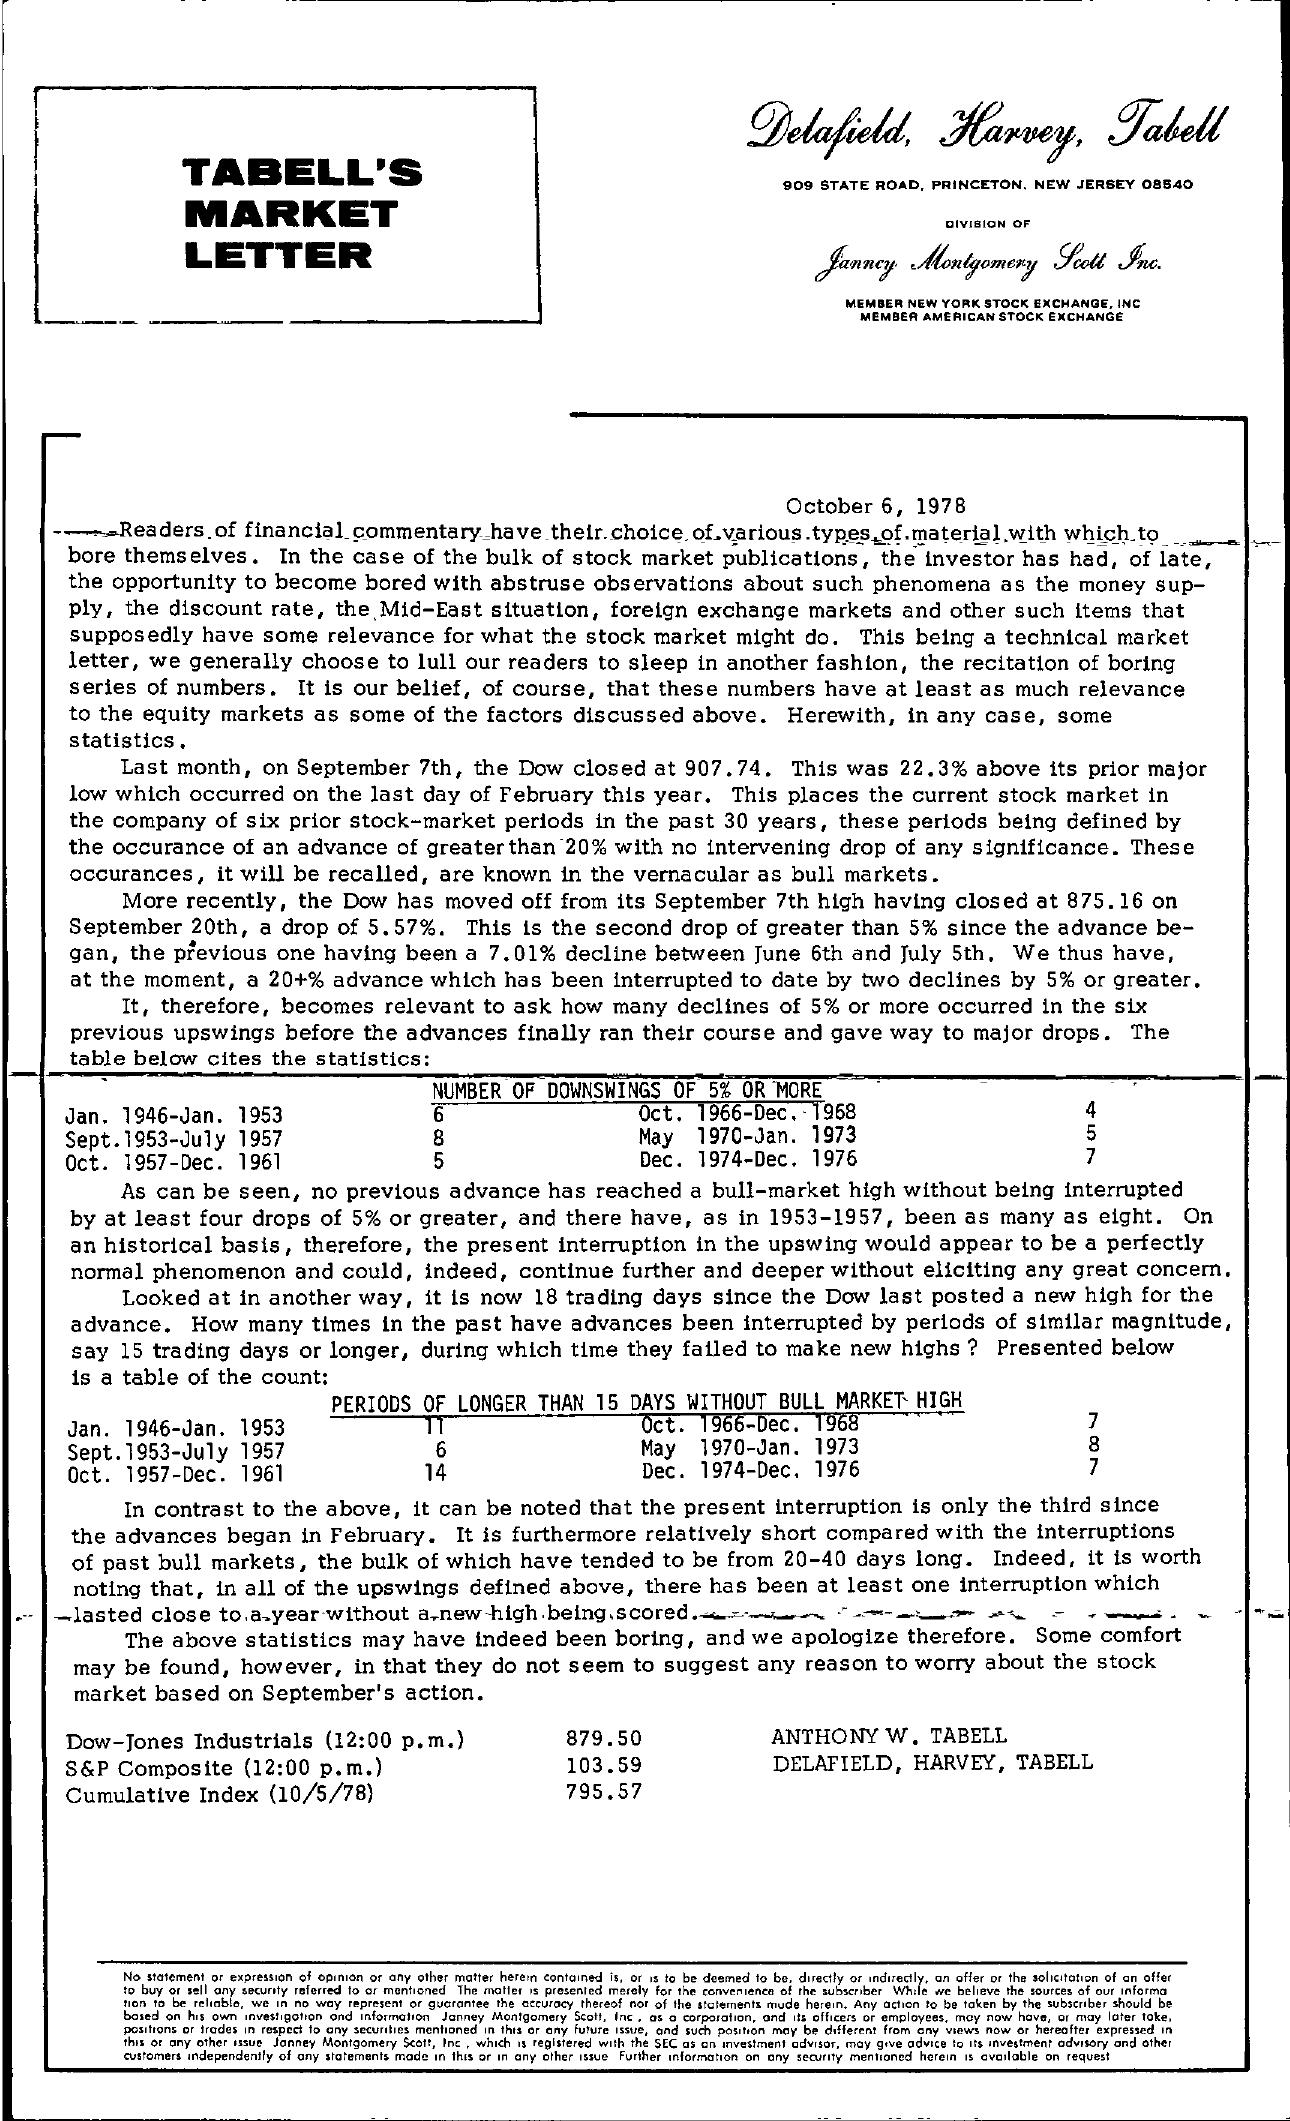 Tabell's Market Letter - October 06, 1978